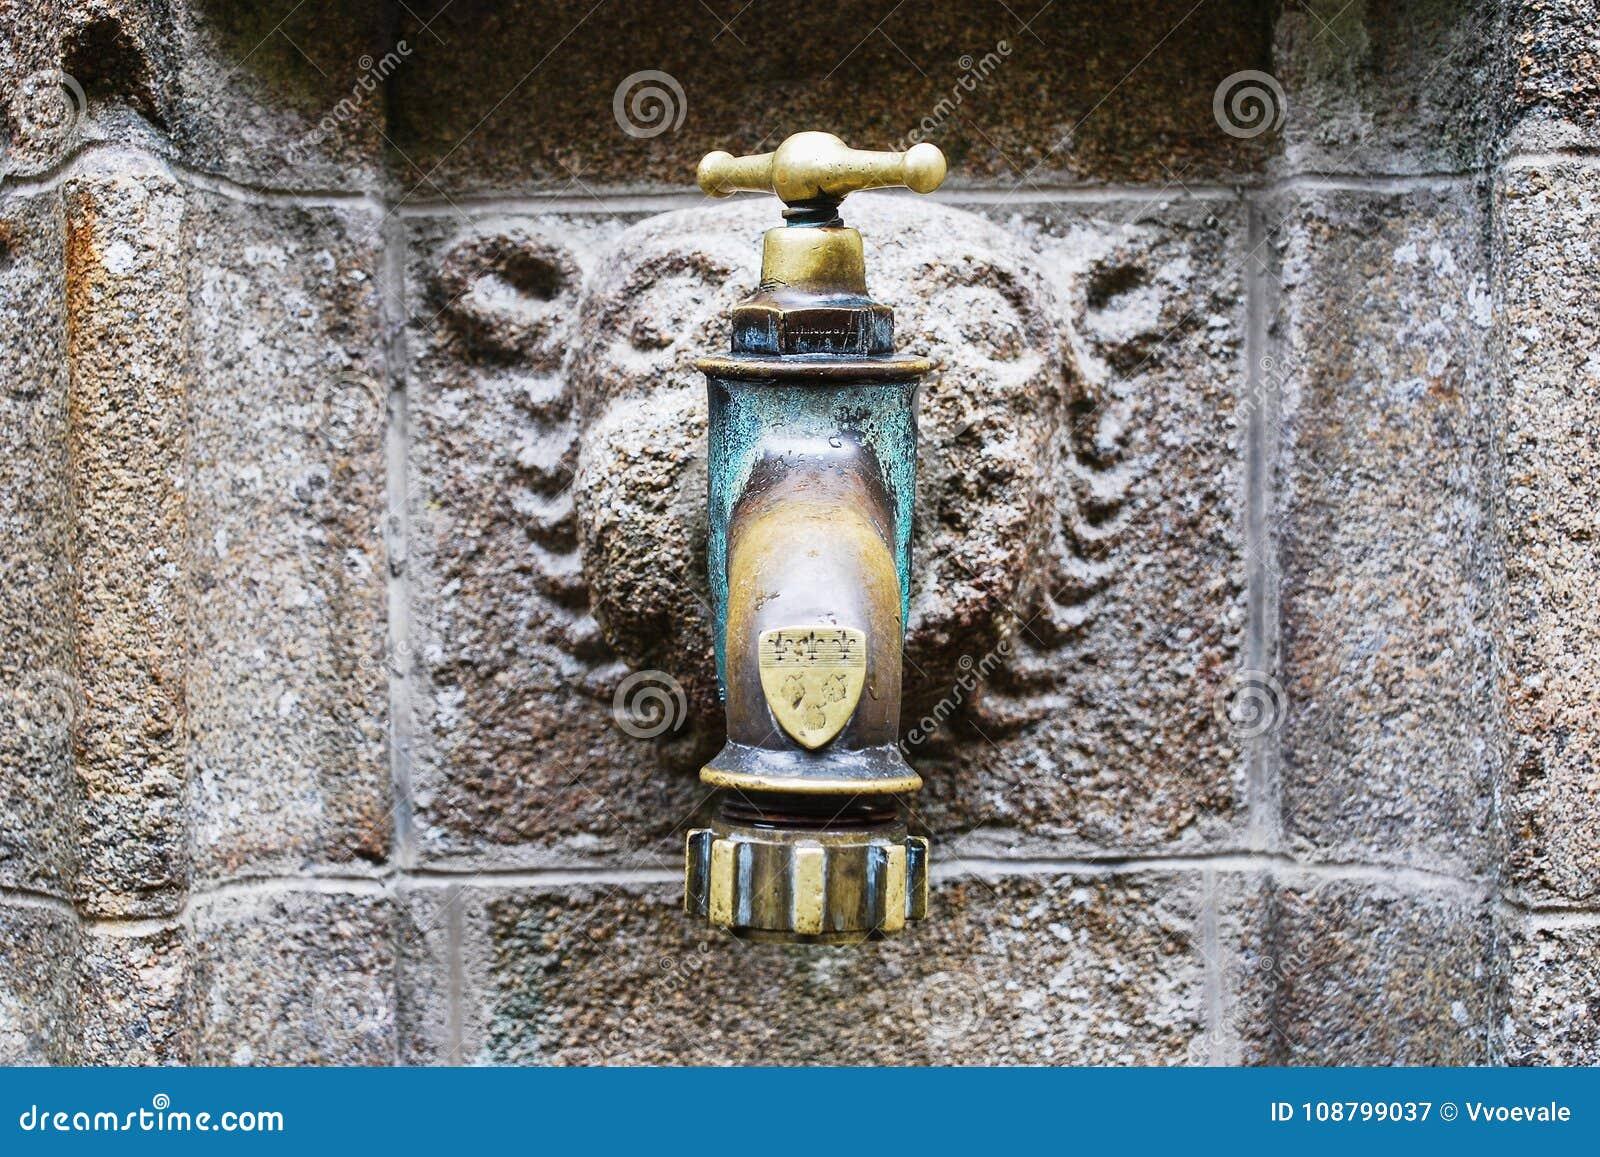 Torneira de água medieval de Utdoor em Saint Michael Abbey